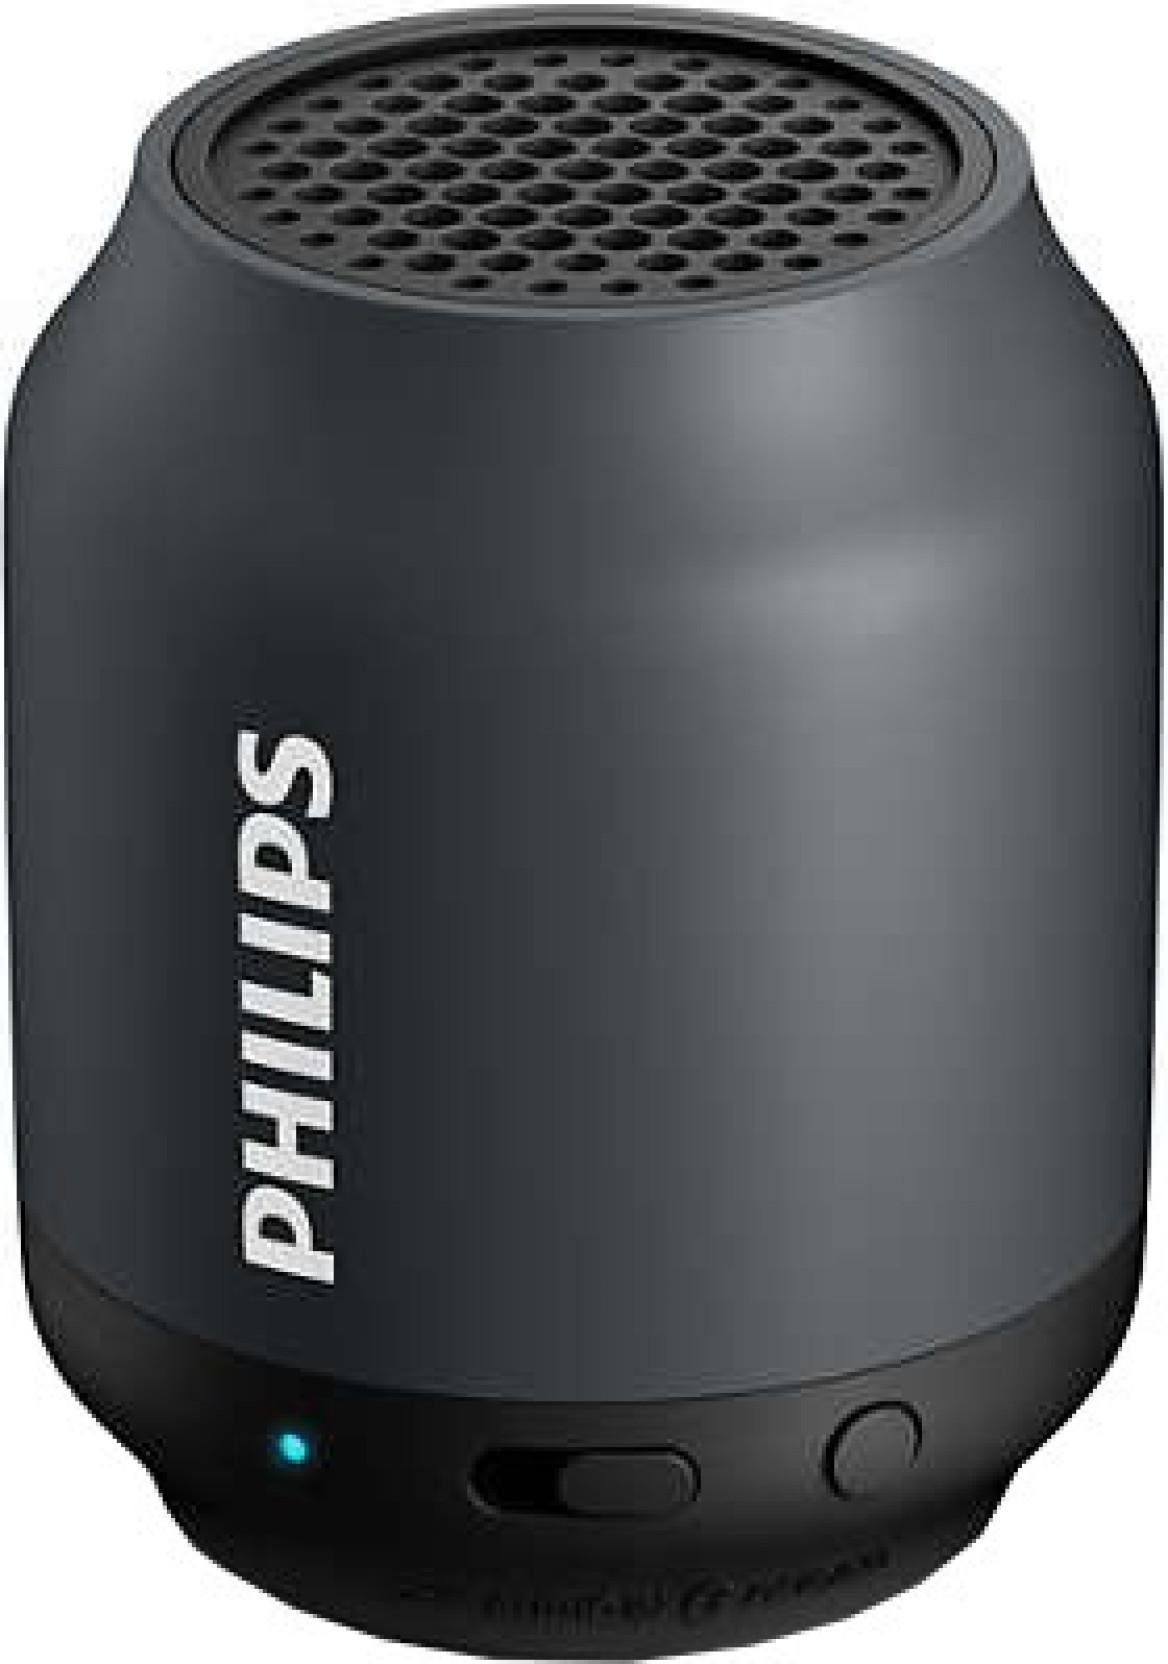 buy philips wireless portable speaker online from